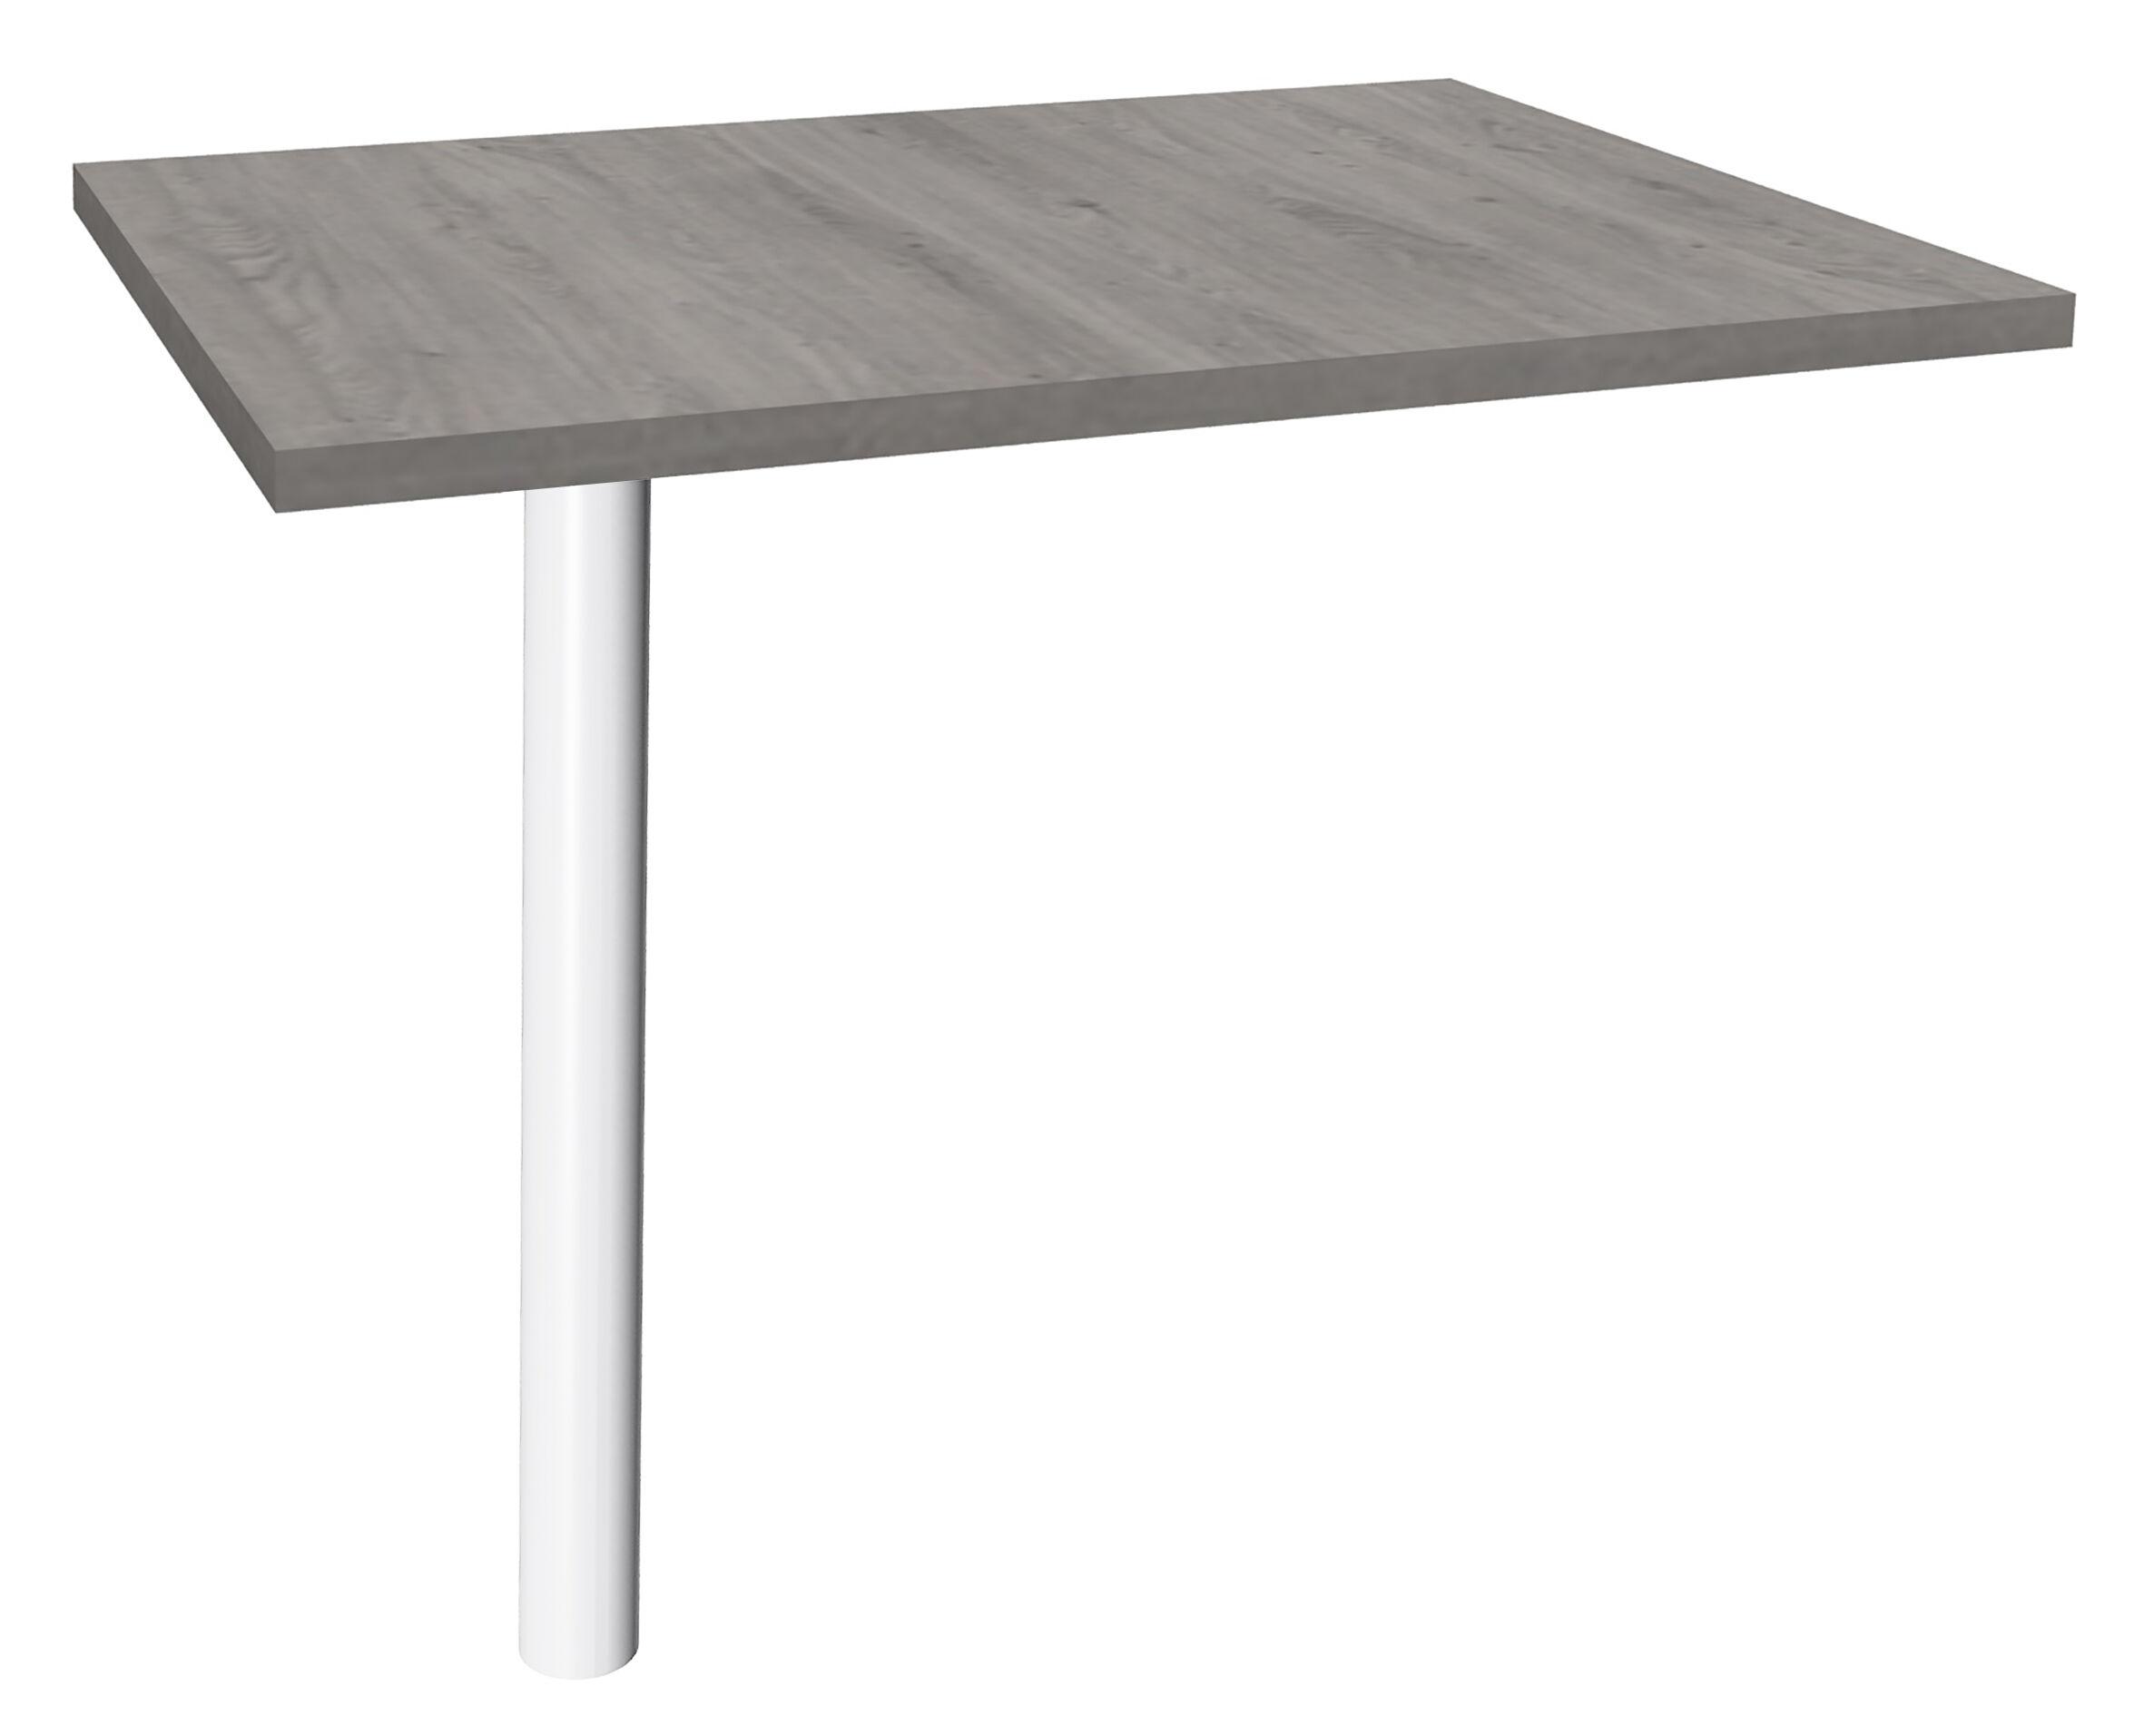 Extension IDRA sur pied tube - 80 x 60 cm - Pied blanc - plateau imitation Chêne gris